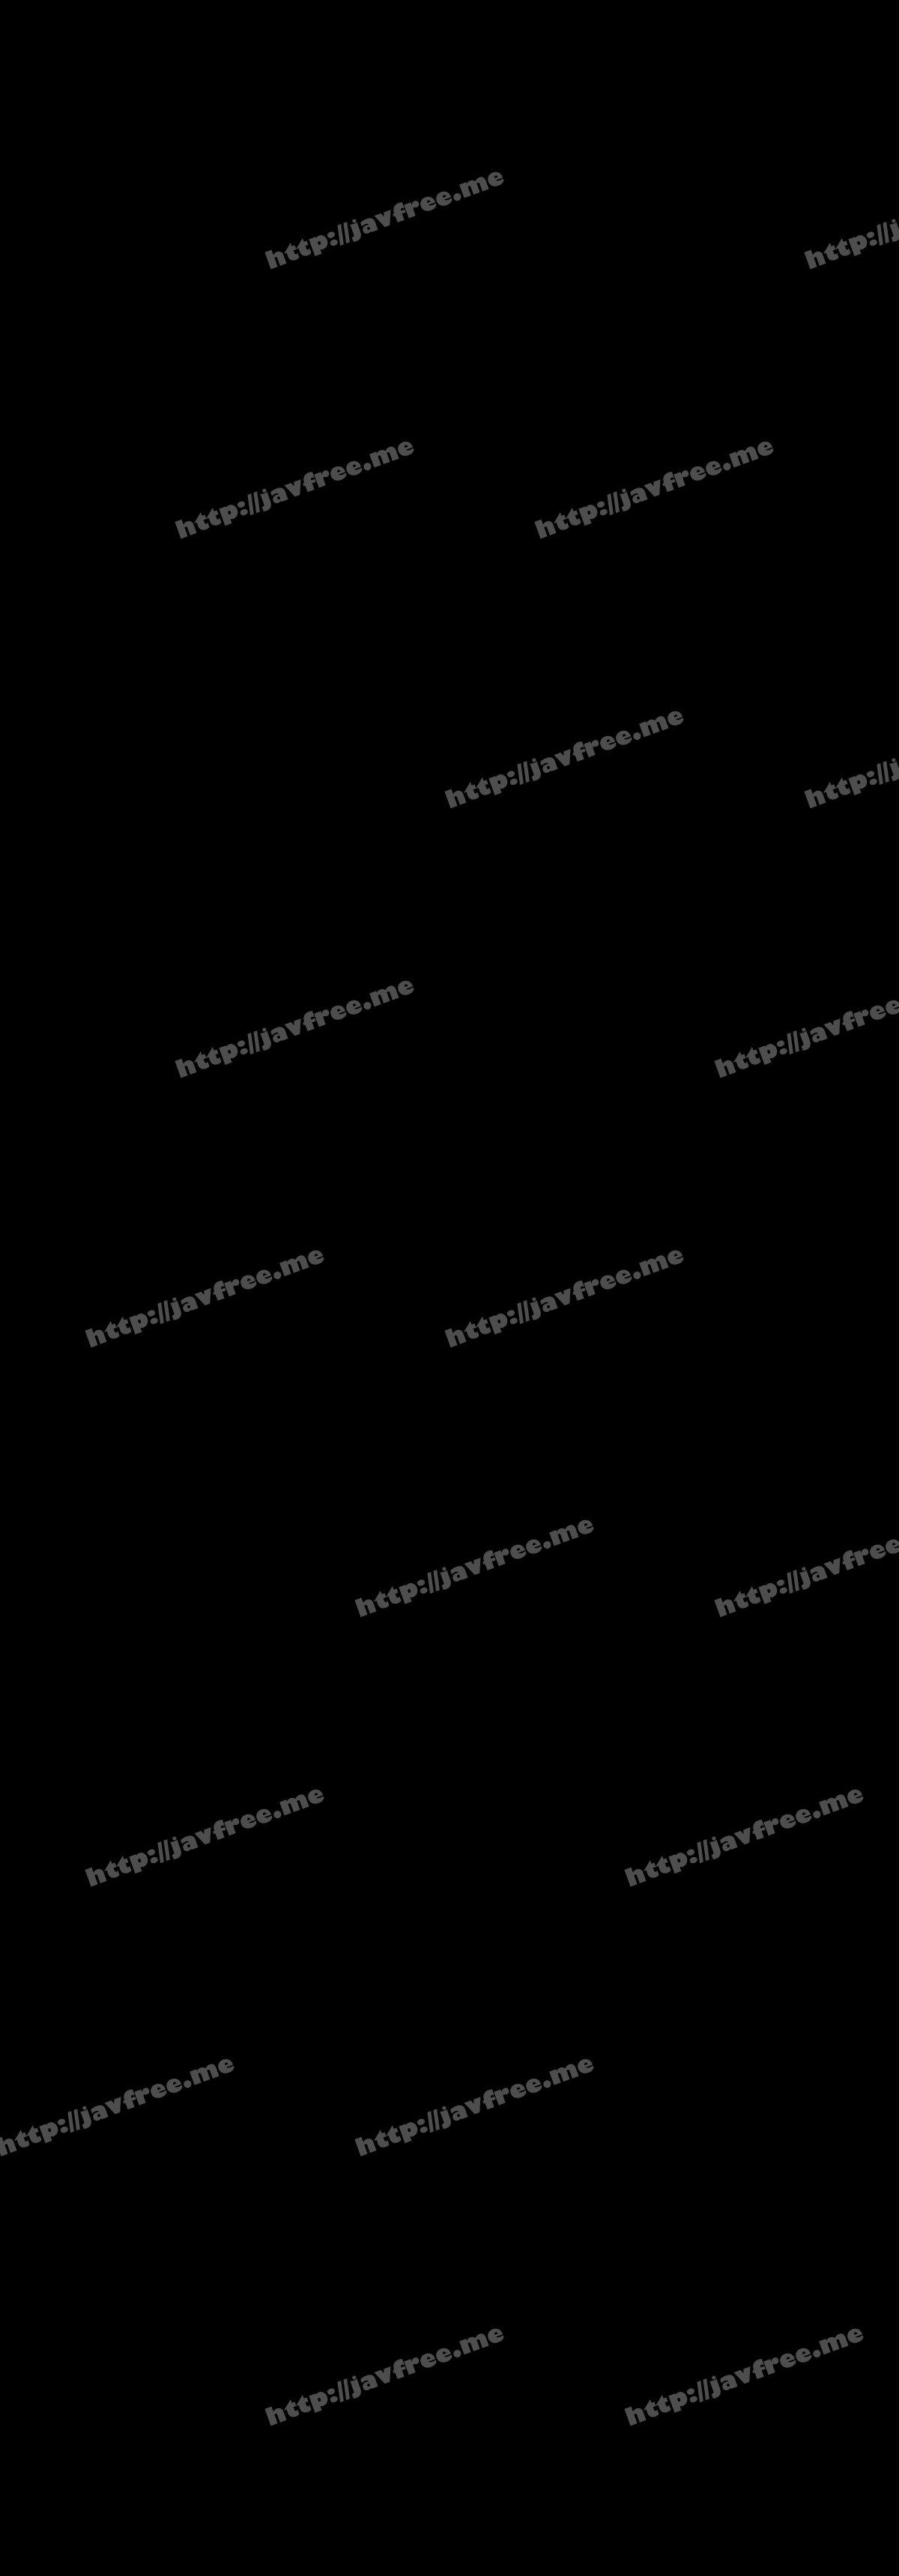 [HD][VNDS-7087] エロ妻のいやらしいフェラチオ口内射精 - image VNDS-7087-1080p on https://javfree.me